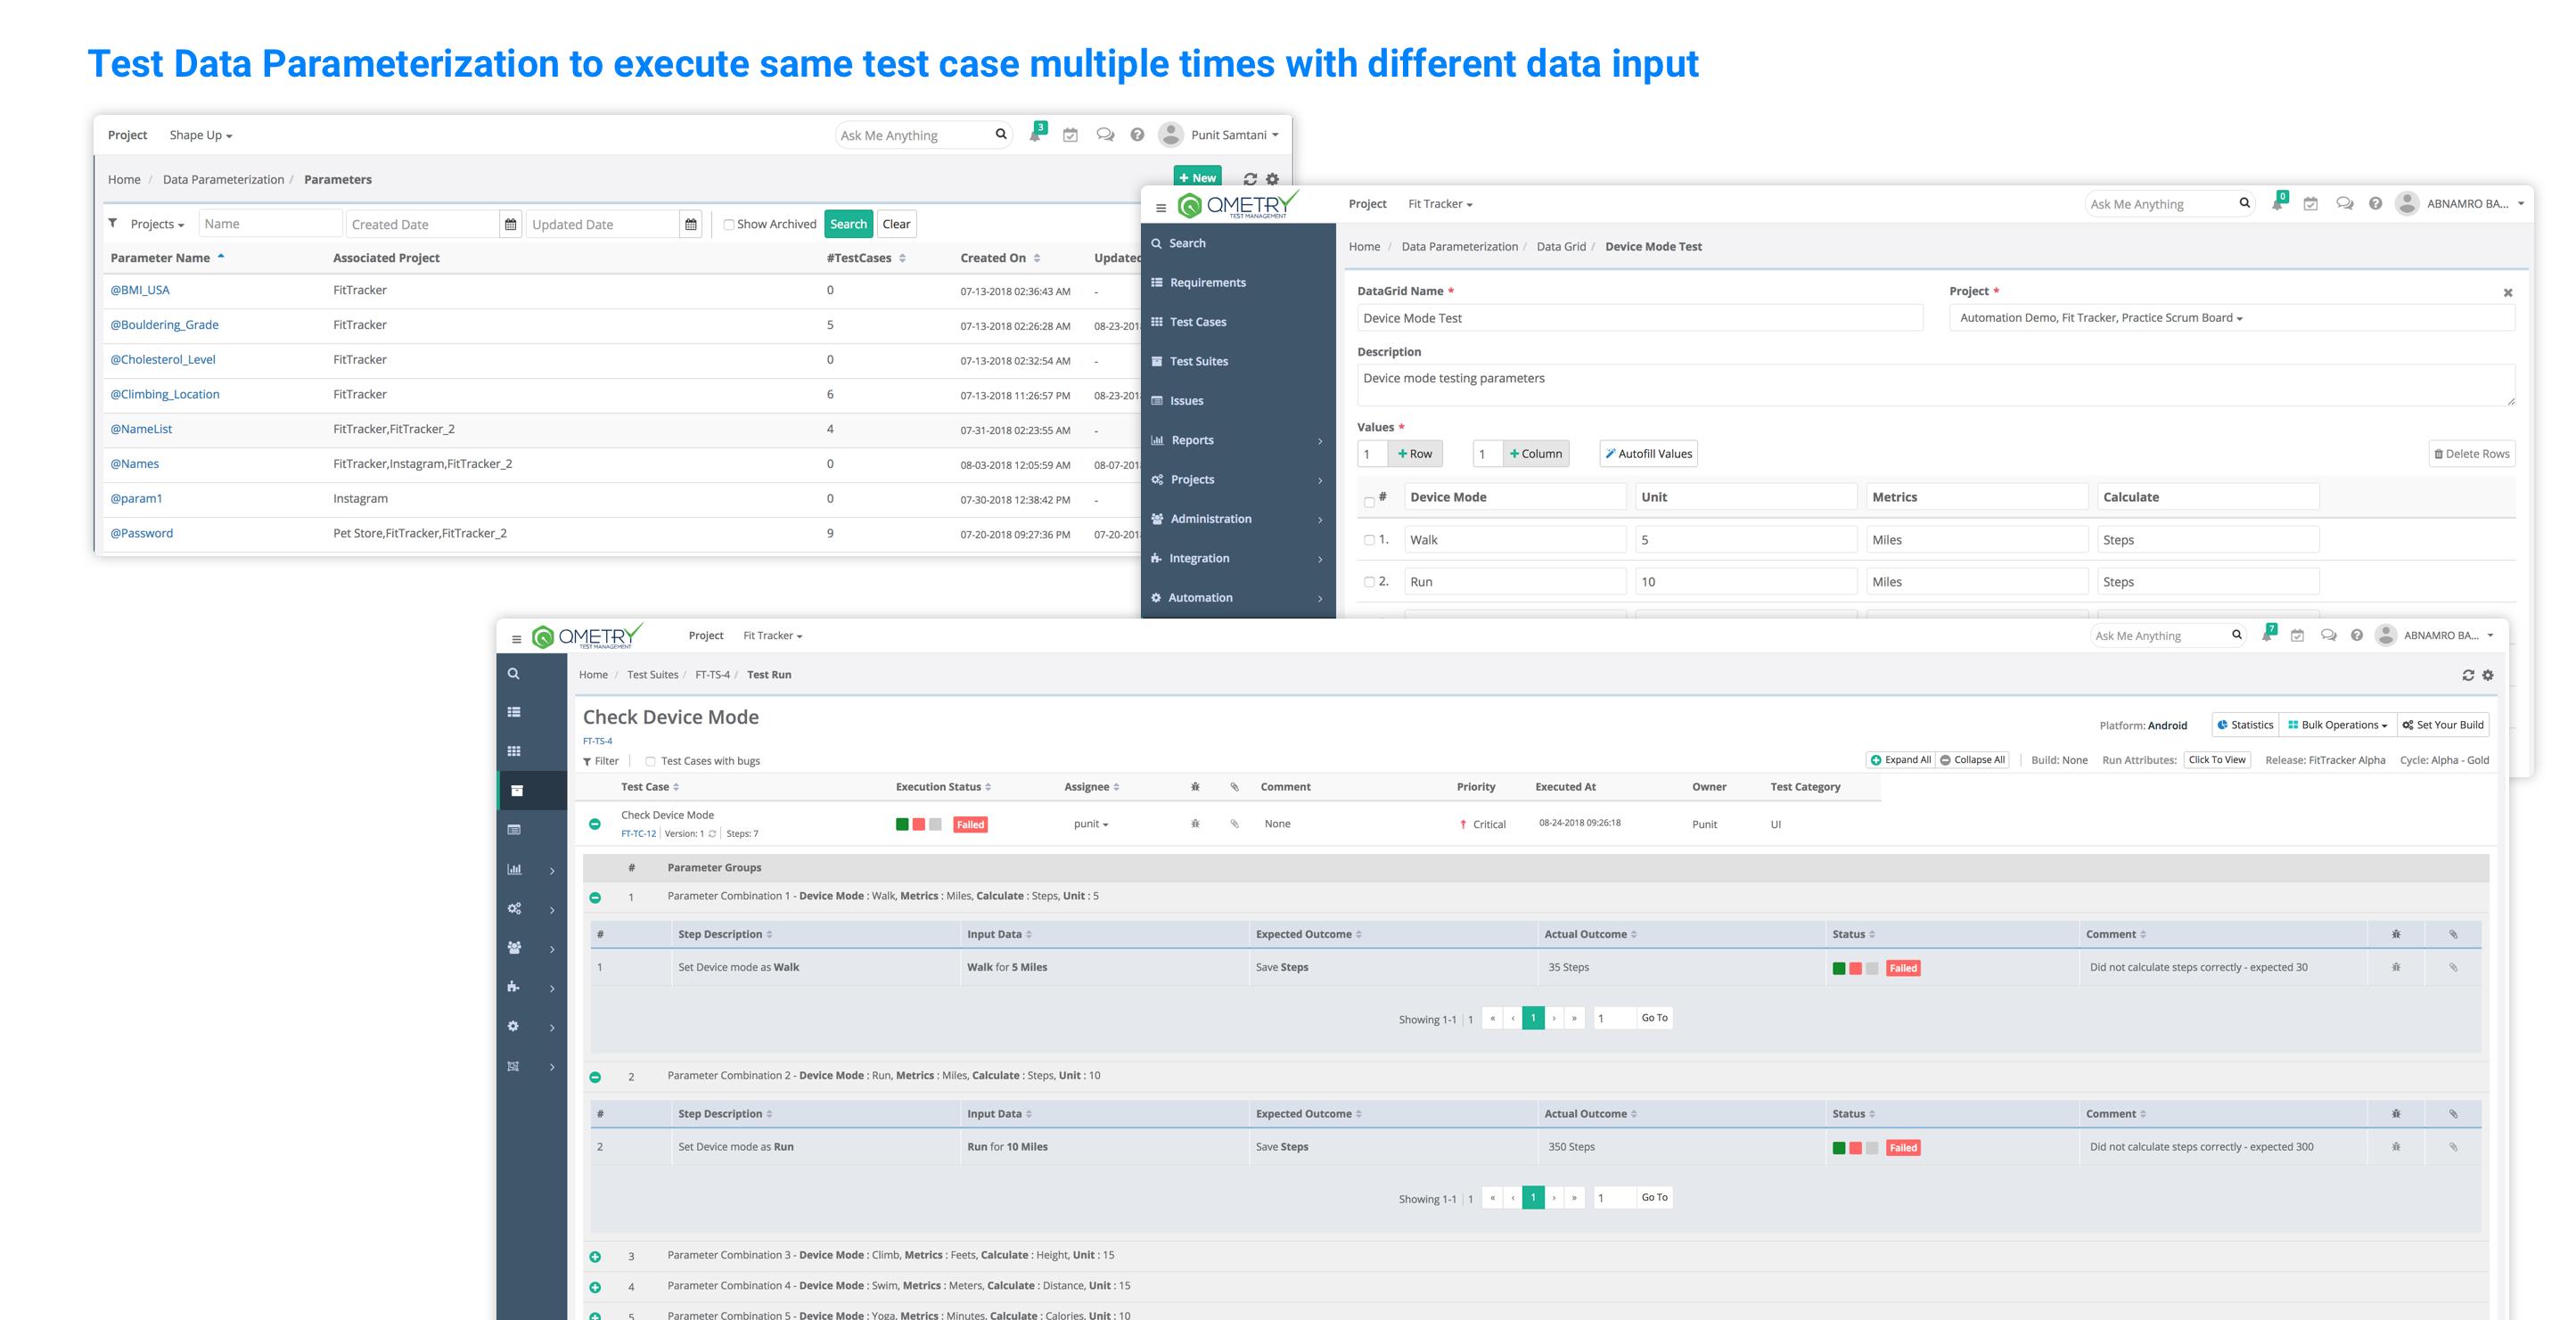 QMetry Test Management Demo - Test Data Parameterization